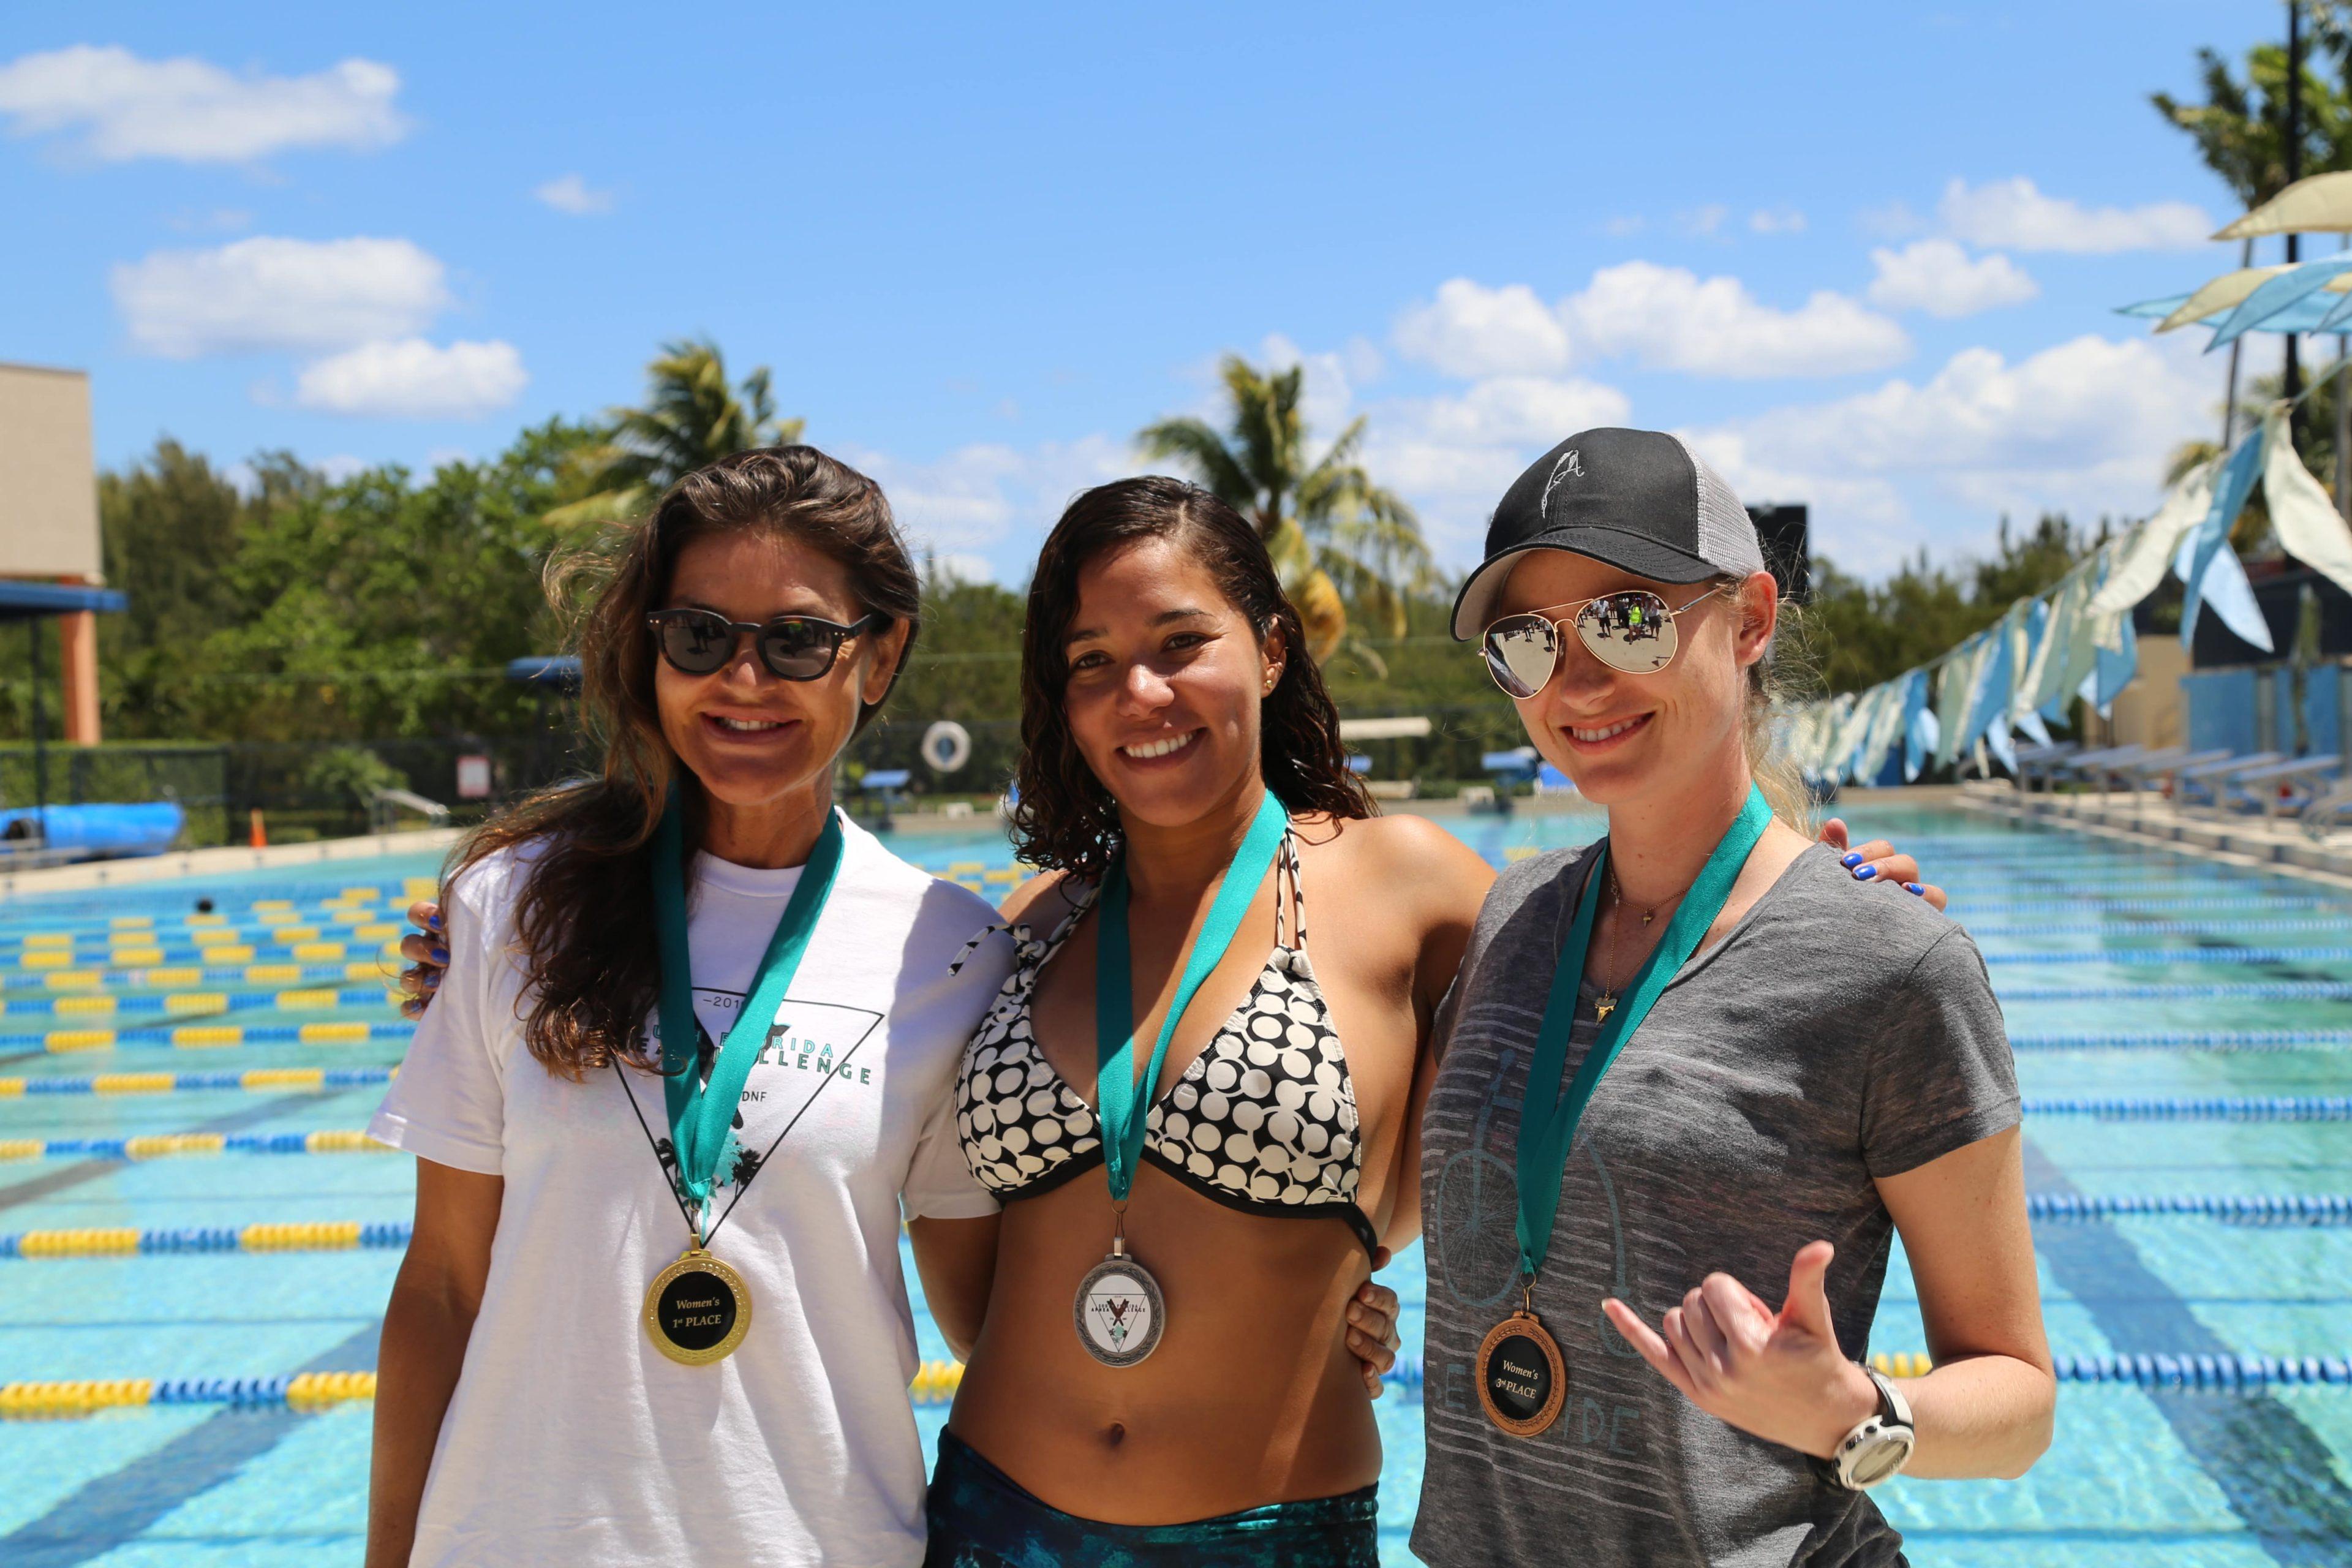 The Lady Winners - Claire Paris (USA), Karla Mendez (Venezuela), Ashleigh Baird (USA)